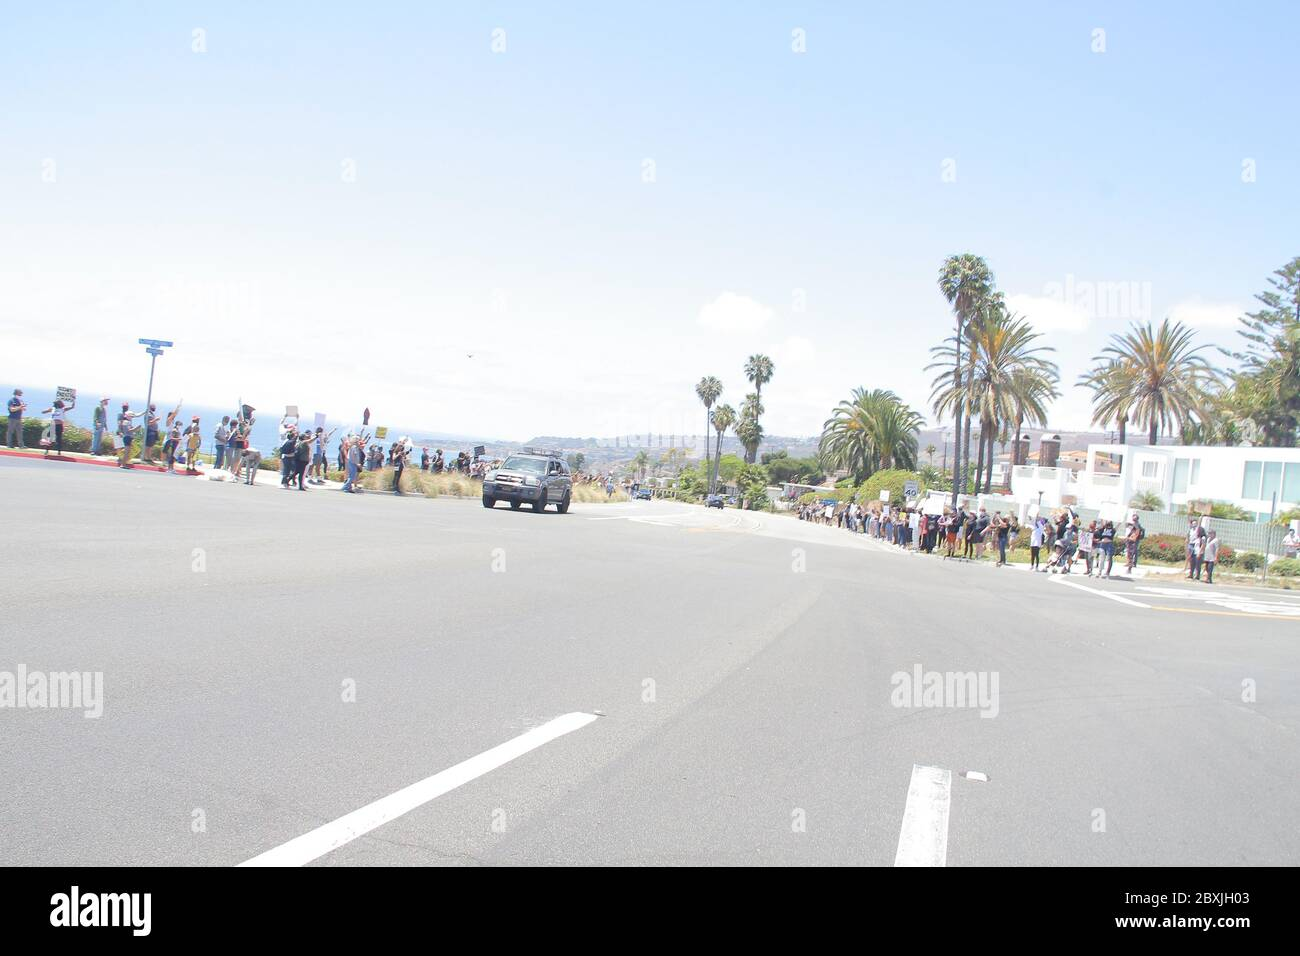 Manifestanti 06/06/2020 manifestanti di fronte al Trump National Golf Club a Rancho Palos Verdes, CA Foto di Izumi Hasegawa/HollywoodNewsWire.net Credit: Hollywood News Wire Inc./Alamy Live News Foto Stock